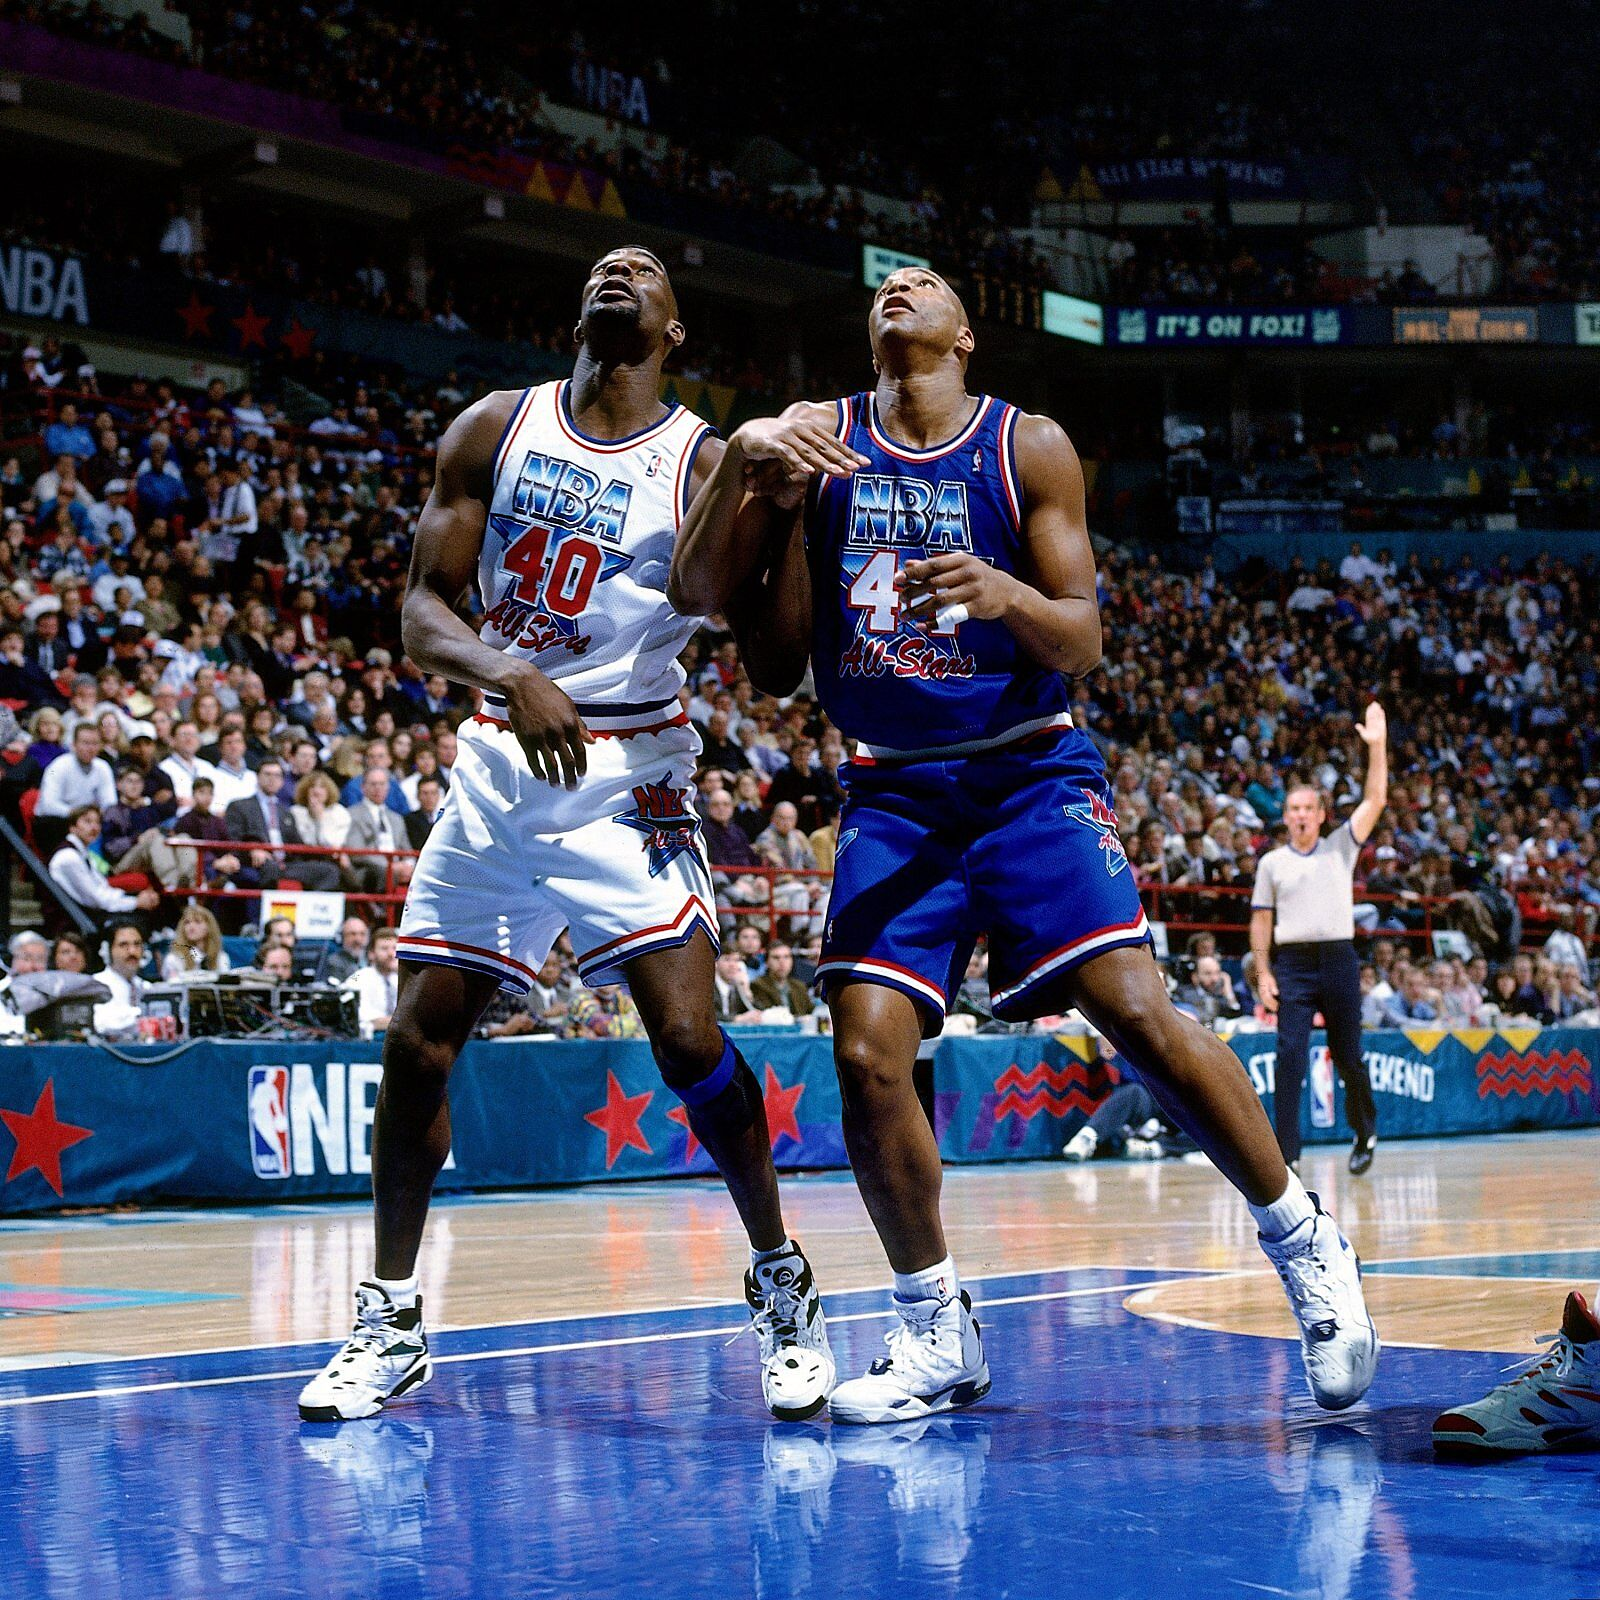 d1c4e9501743 Brooklyn Nets NBA All-Star Game. Brooklyn Nets NBA All-Star Game. Mandatory  Copyright Notice  Copyright 1994 ...